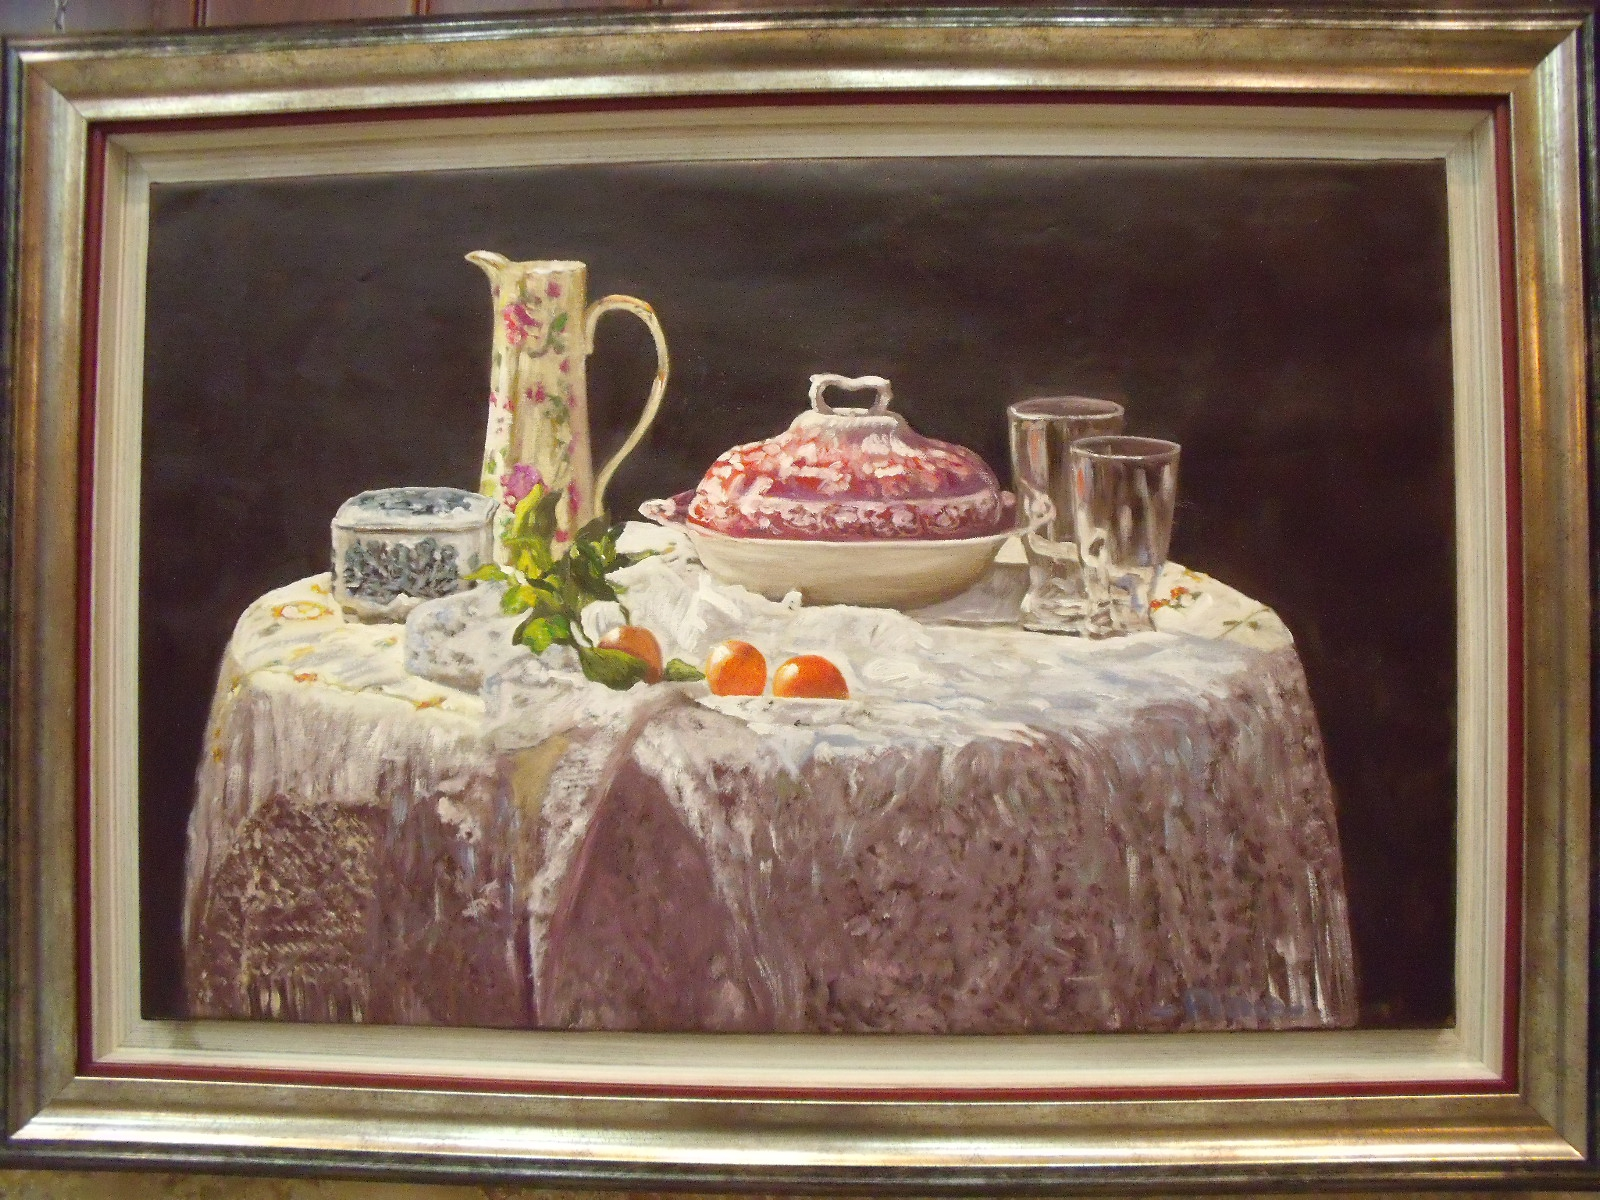 Charterhouse tableware